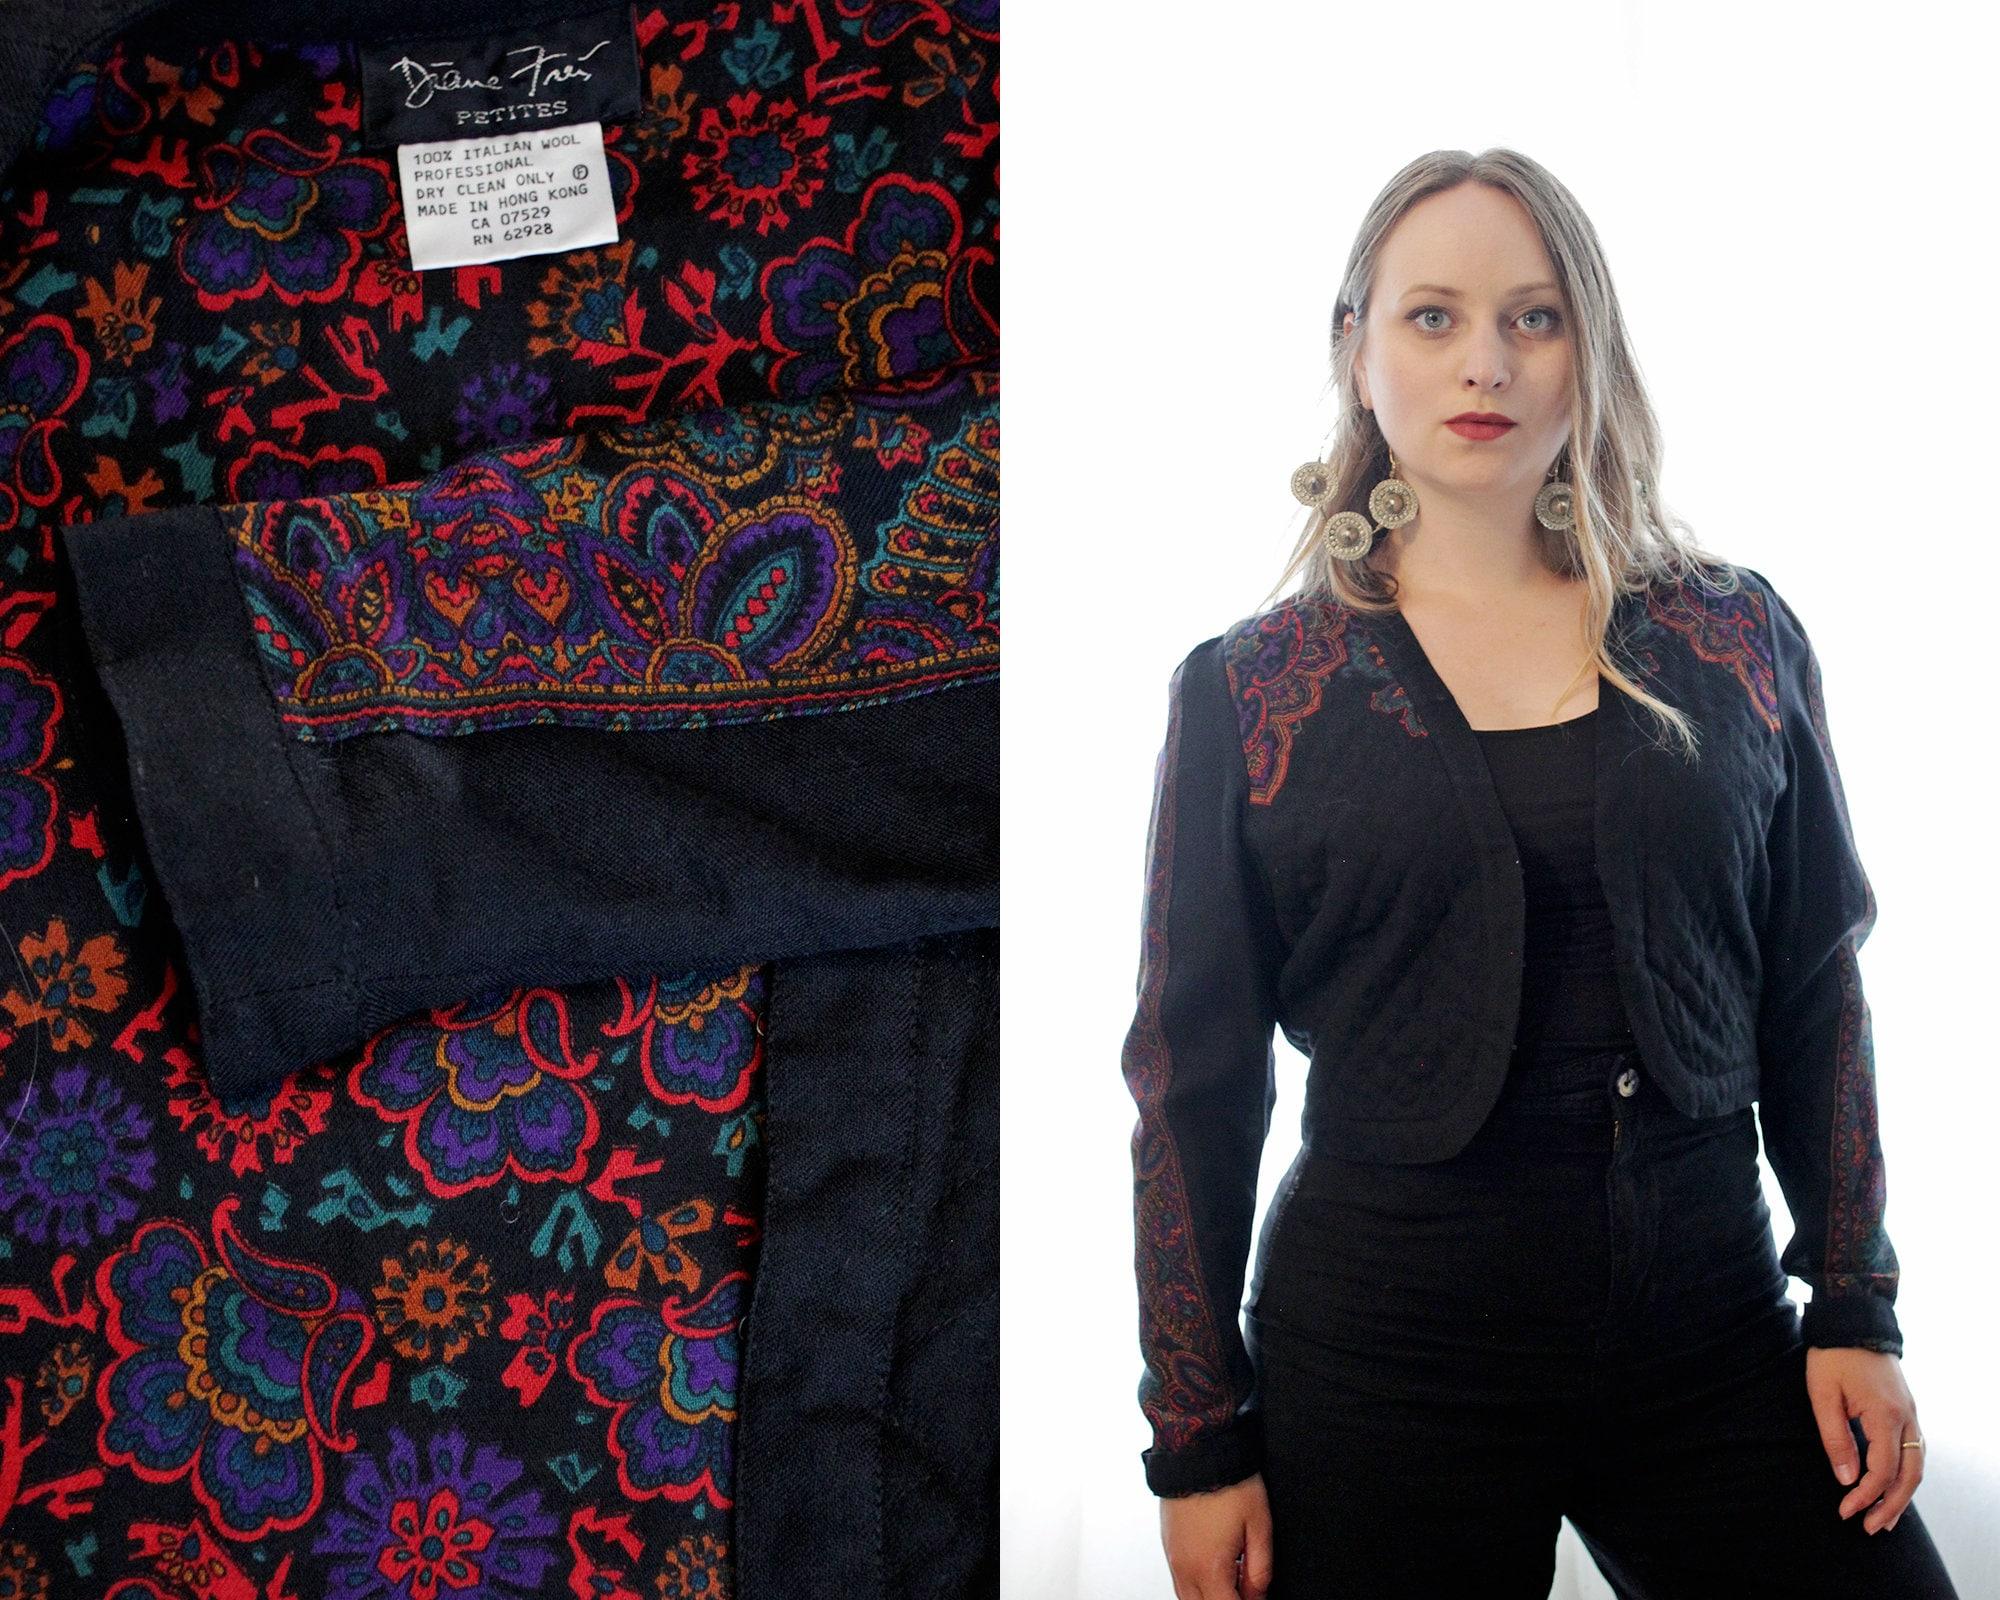 Vintage Scarf Styles -1920s to 1960s Vintage Diane Freis Petites 100 Italian Wool Cropped Gothic Scarf Print Black Quilted Bolero Shrug Jacket $72.25 AT vintagedancer.com